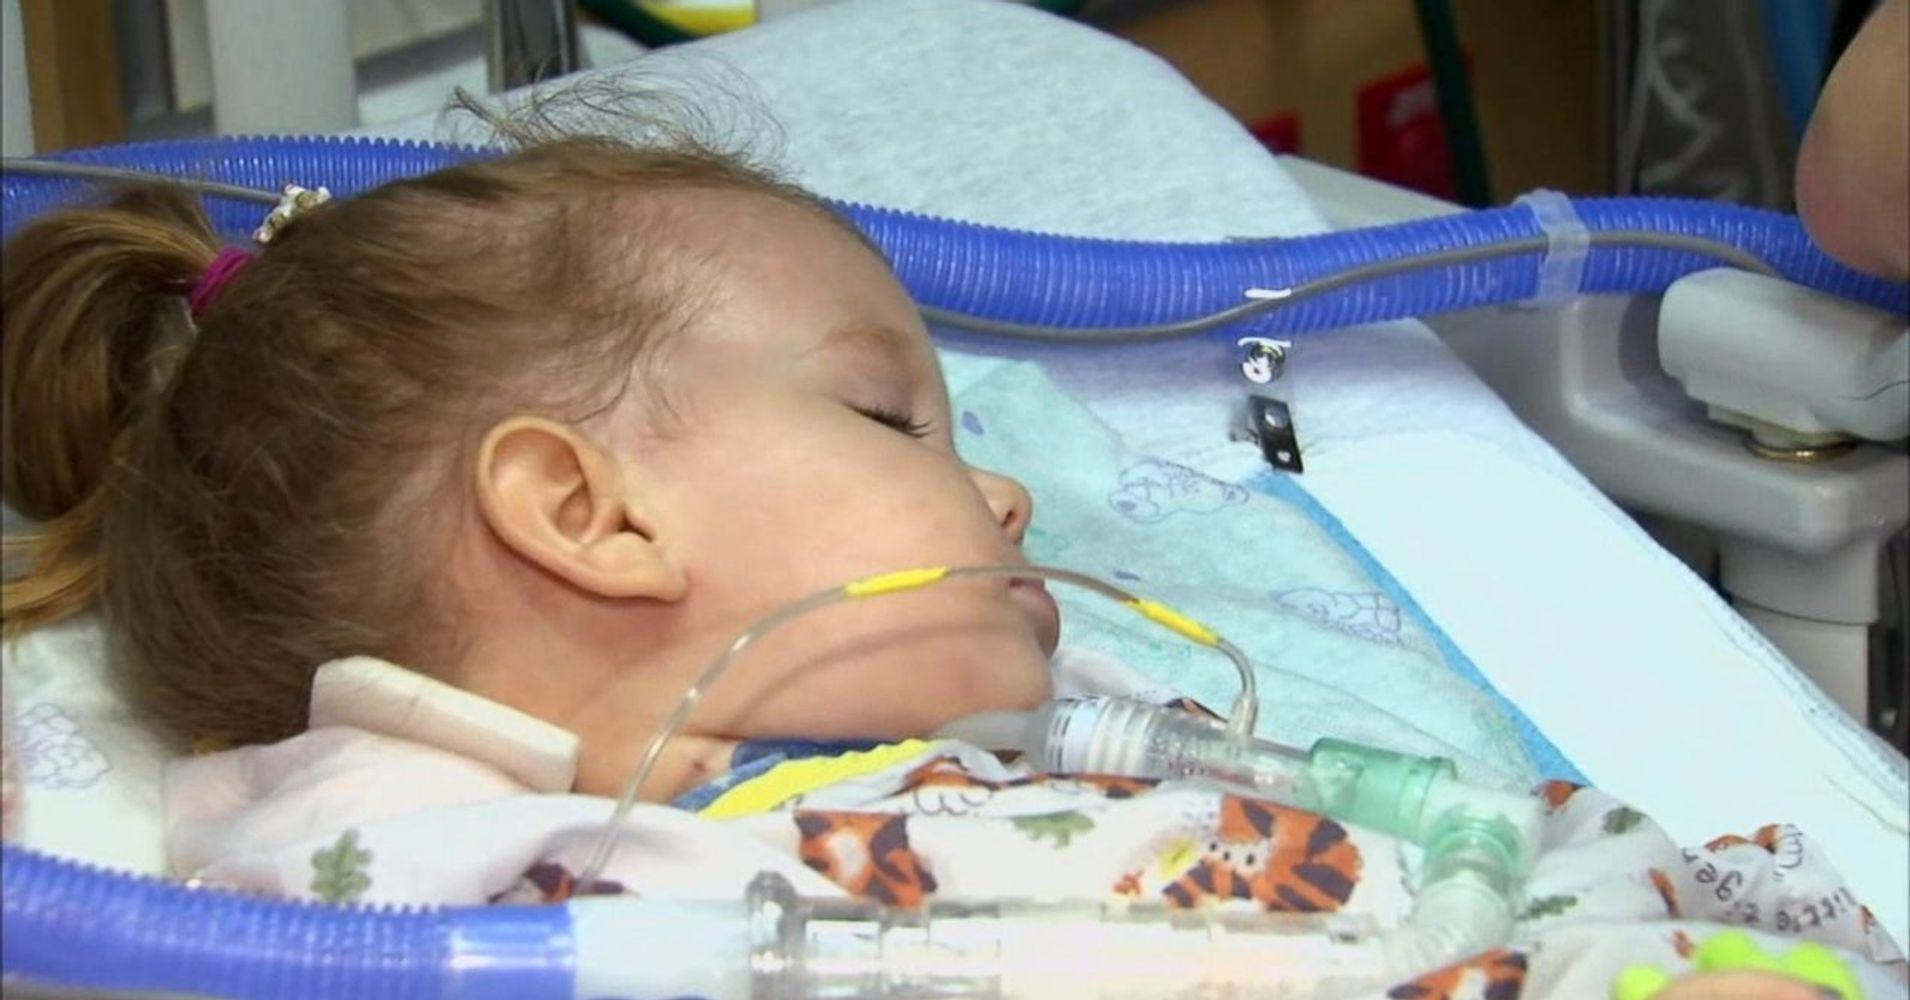 CDC Warns Of Polio-Like Mystery Illness That's Paralyzing Kids